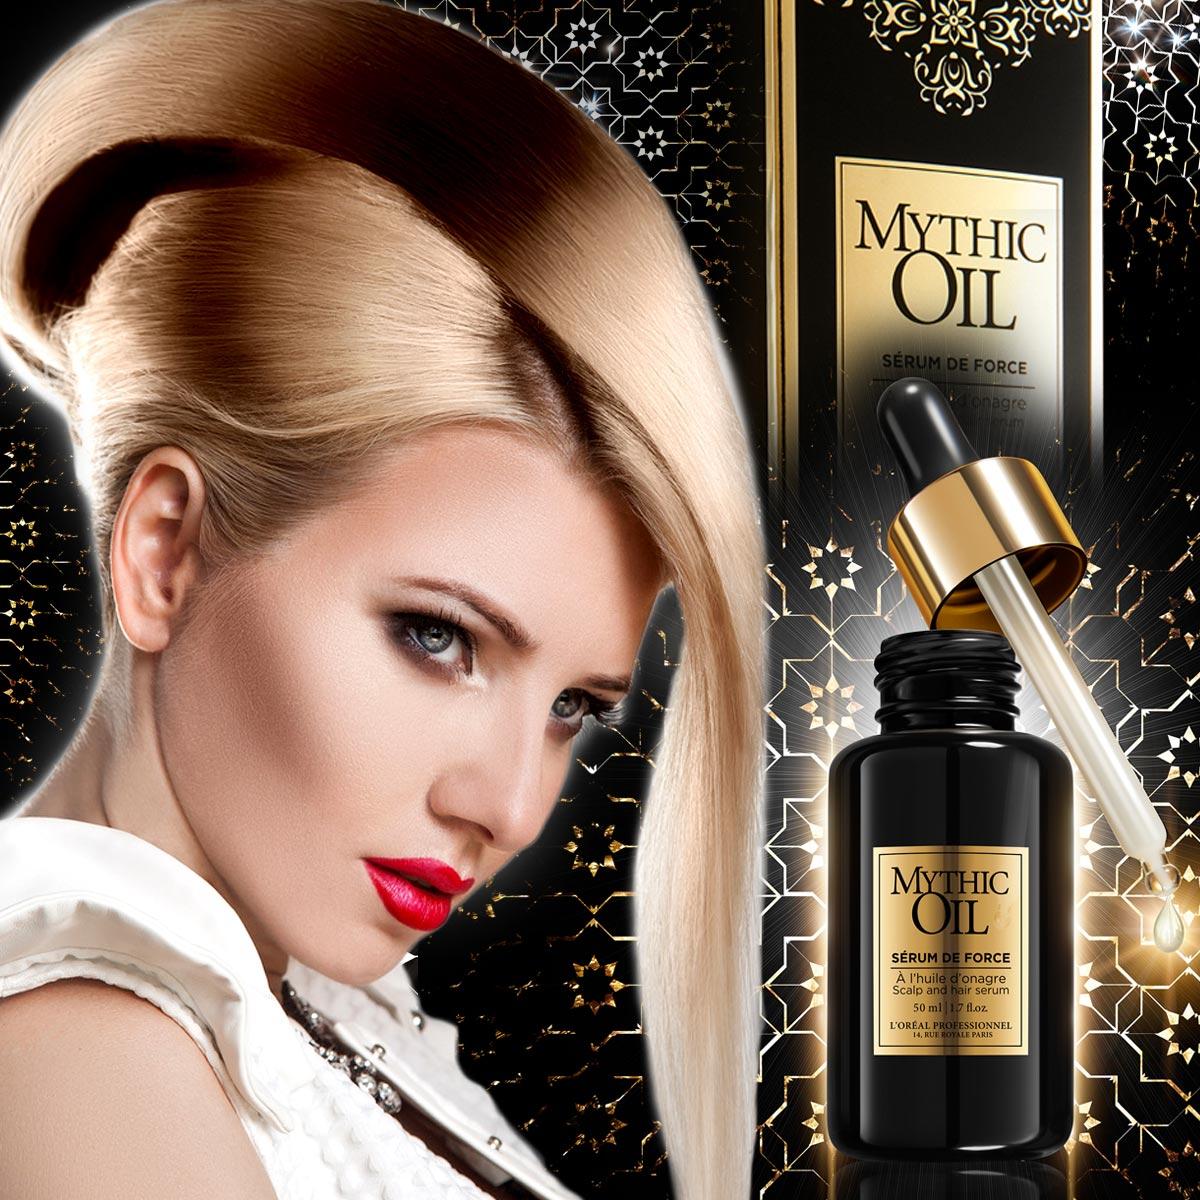 Sérum de Force z radu Mythic Oil sľubuje pomoc pre oslabené vlasy.